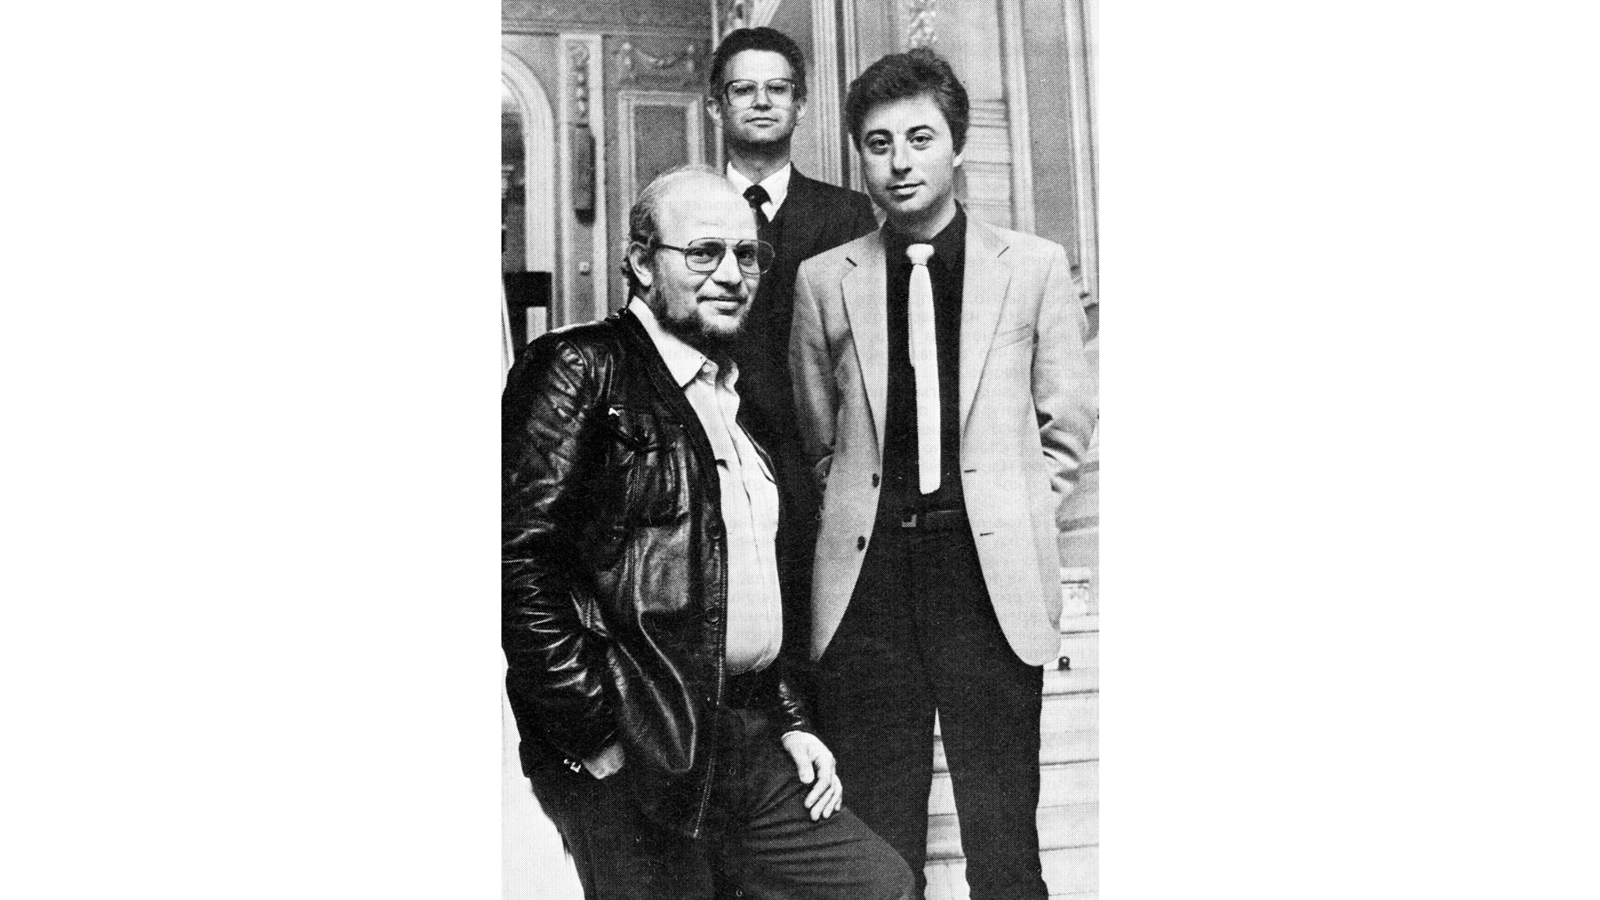 Авторы проекта: Юрий Батурин, Юрий Энтин, Михаил Федотов. 1990 год